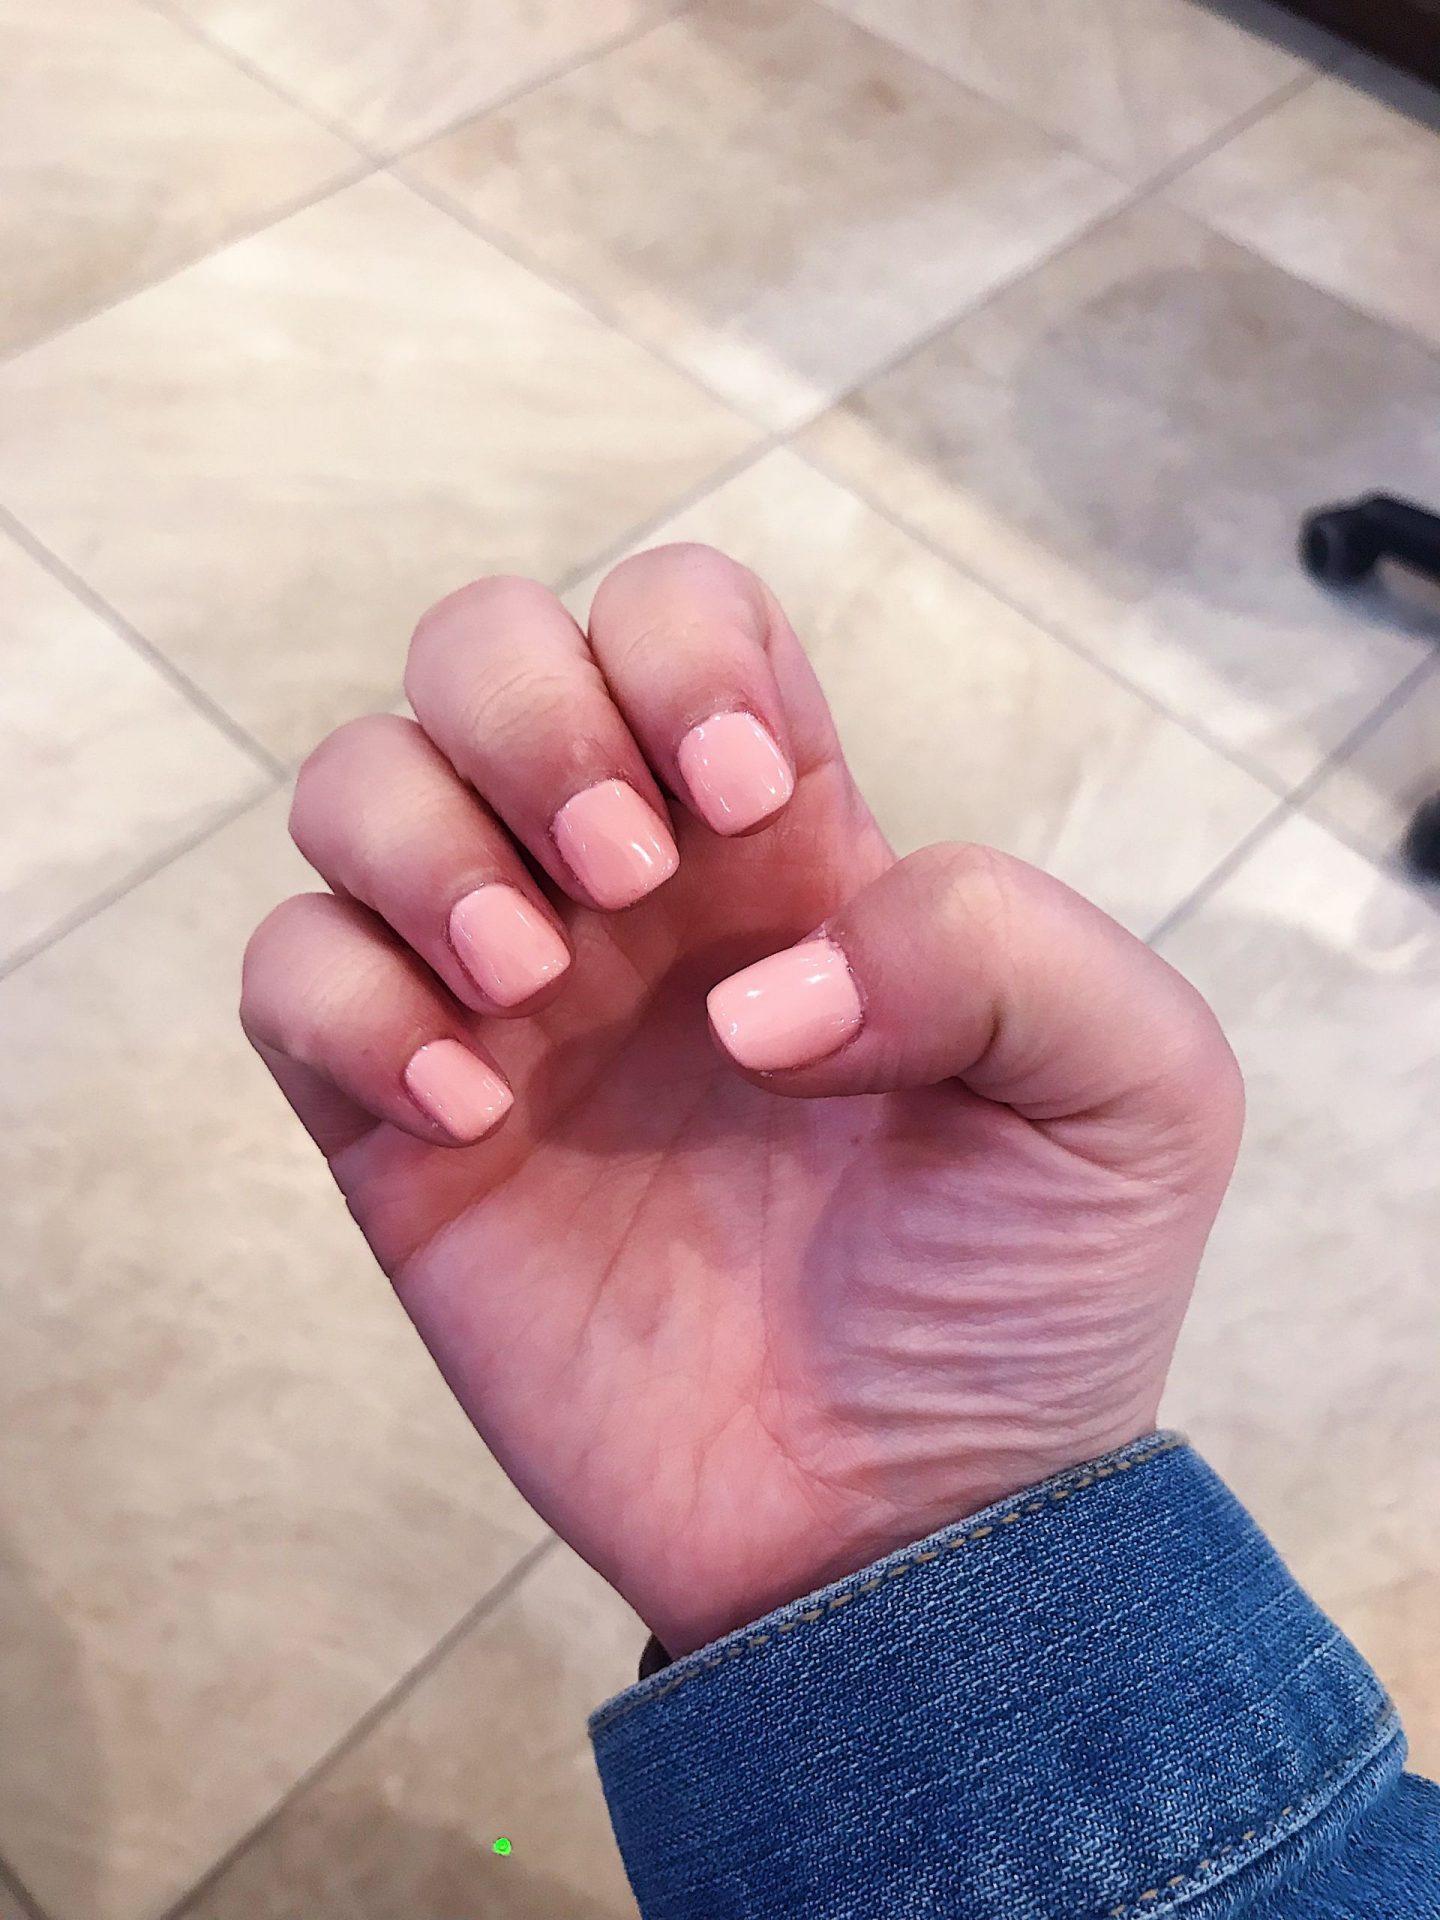 Peachy Keen gel nails